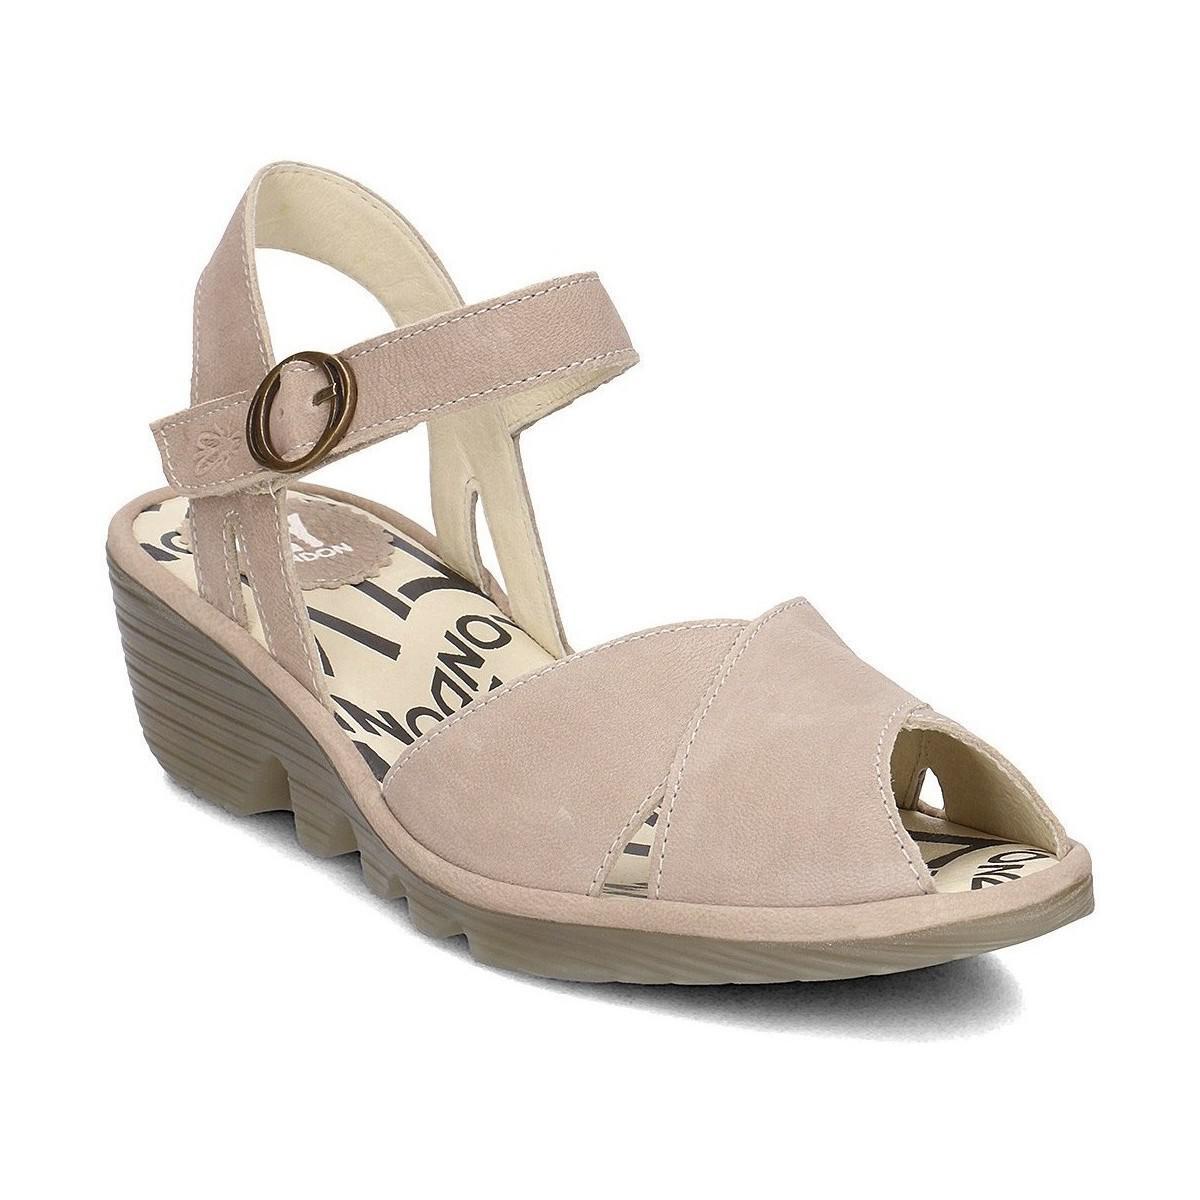 Fly London P500844007 women's Sandals in Discount Buy Finishline Sale Online Discount Visit Best Place Sast Cheap Online gR2Rt41CVH